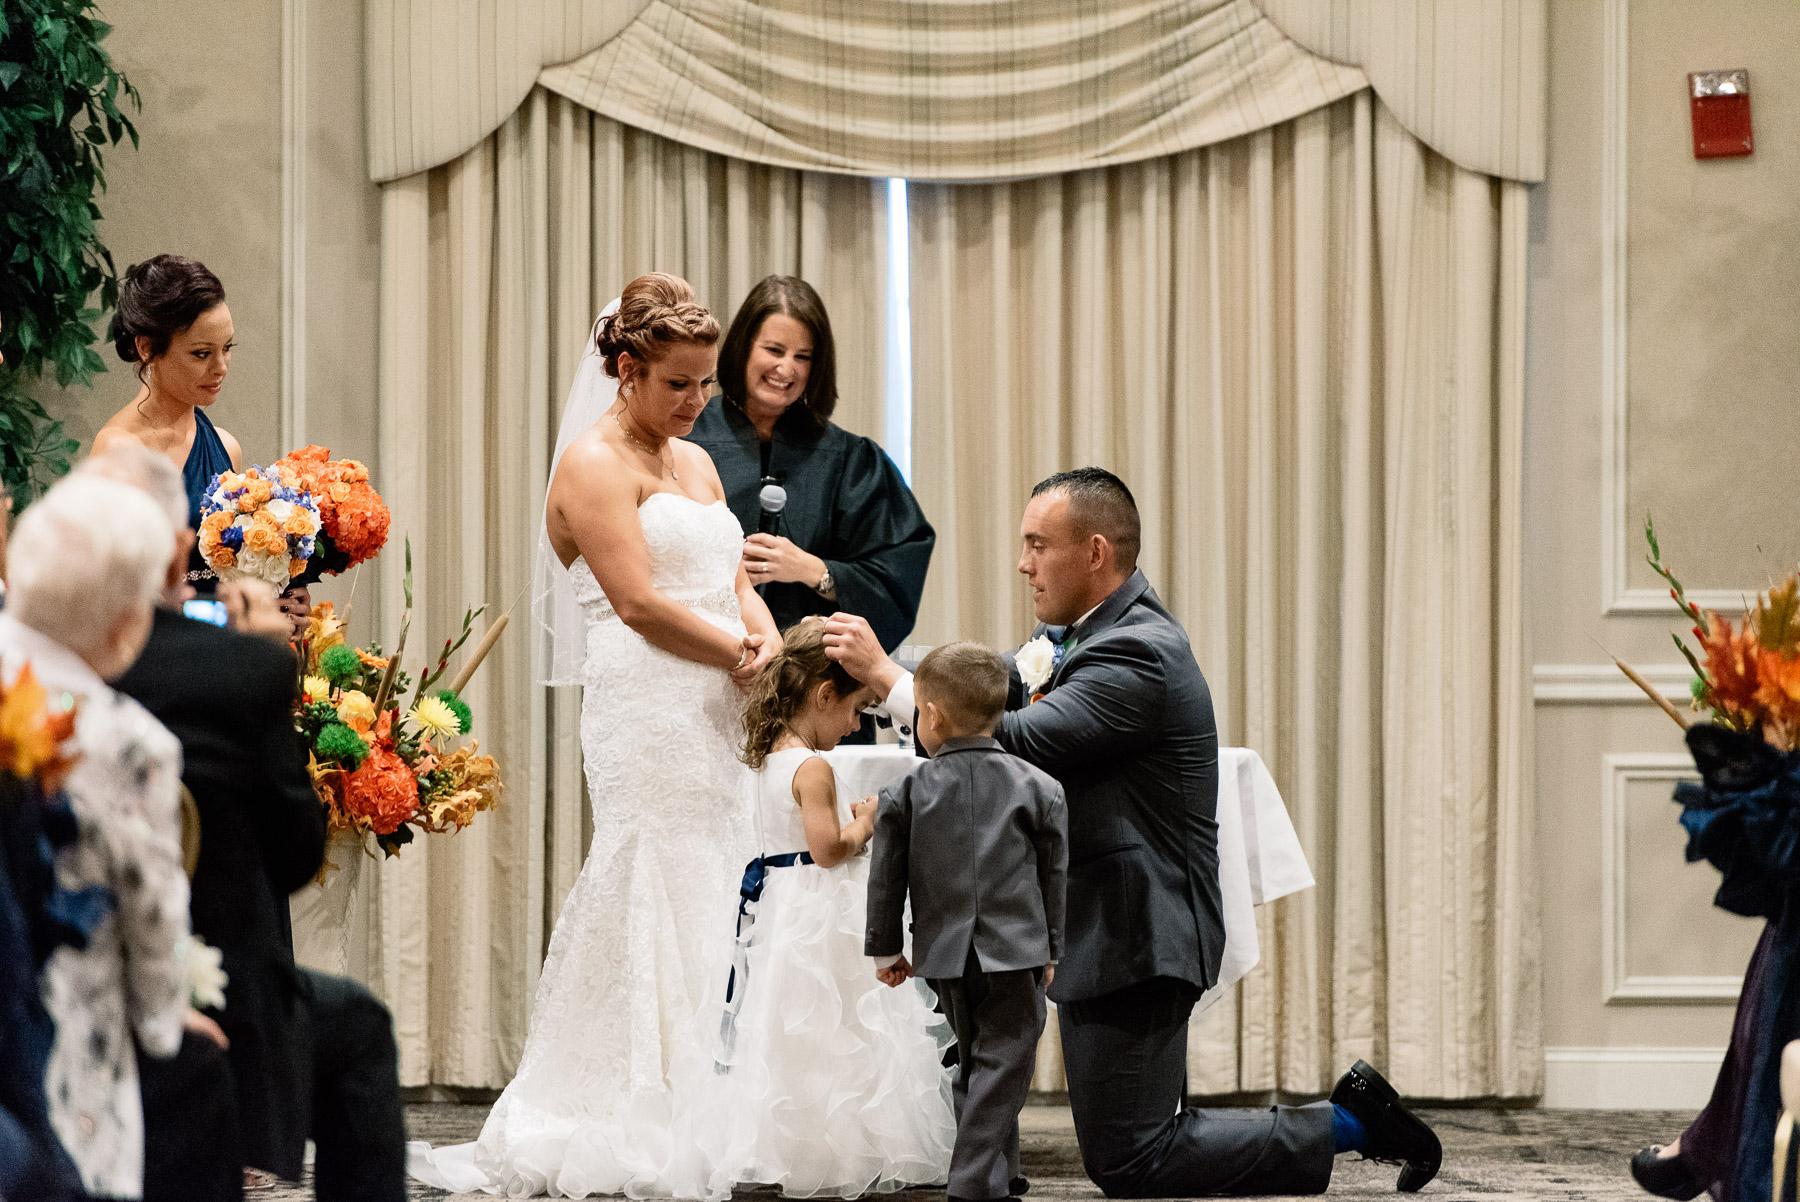 springfield-country-club-wedding-photo-39.jpg